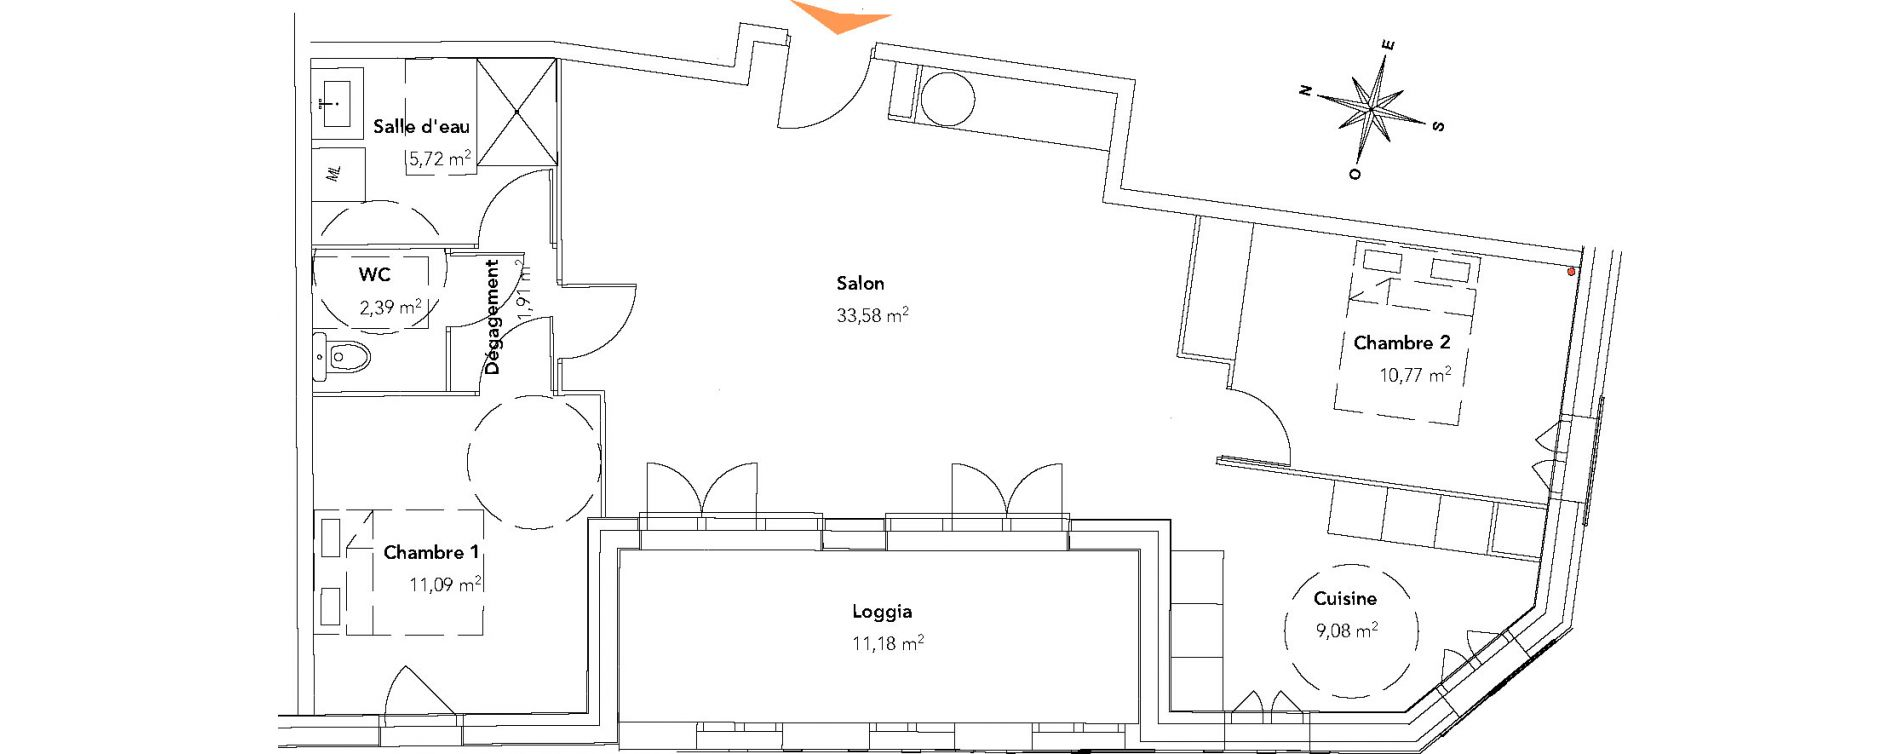 Appartement T3 de 74,54 m2 à Bègles La ferrade